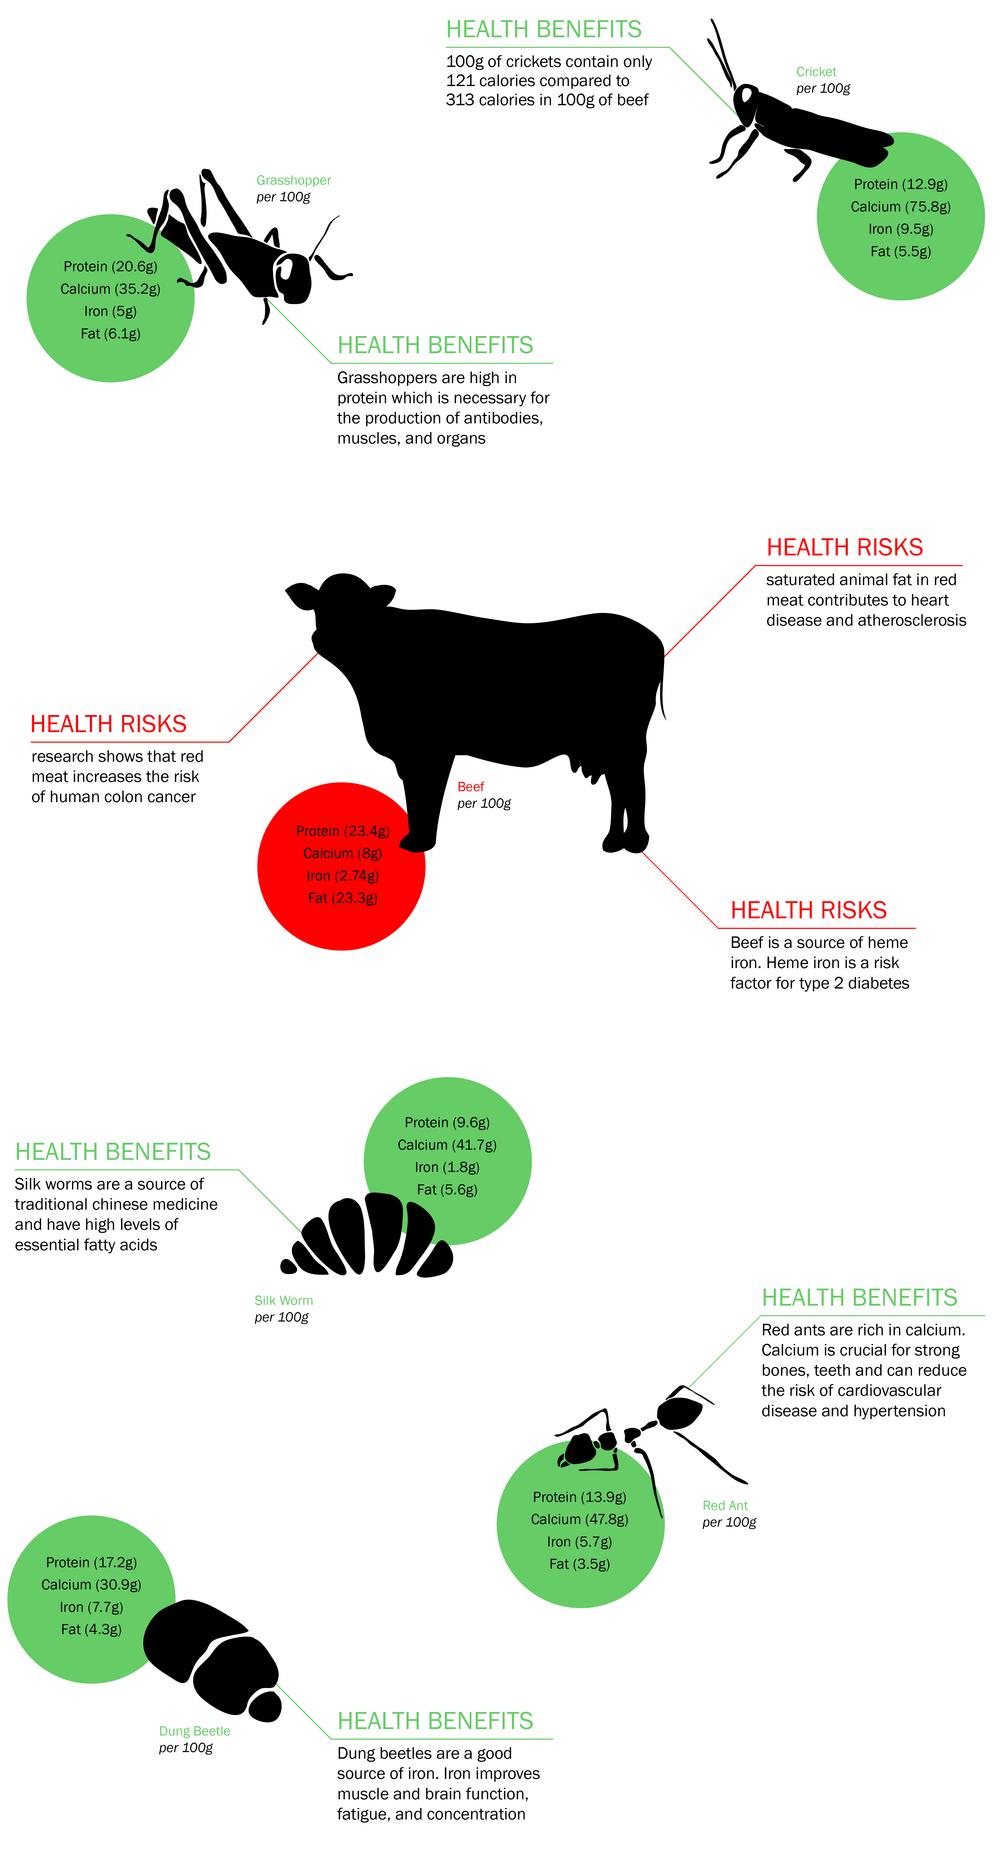 entomo_infographic_health.jpg